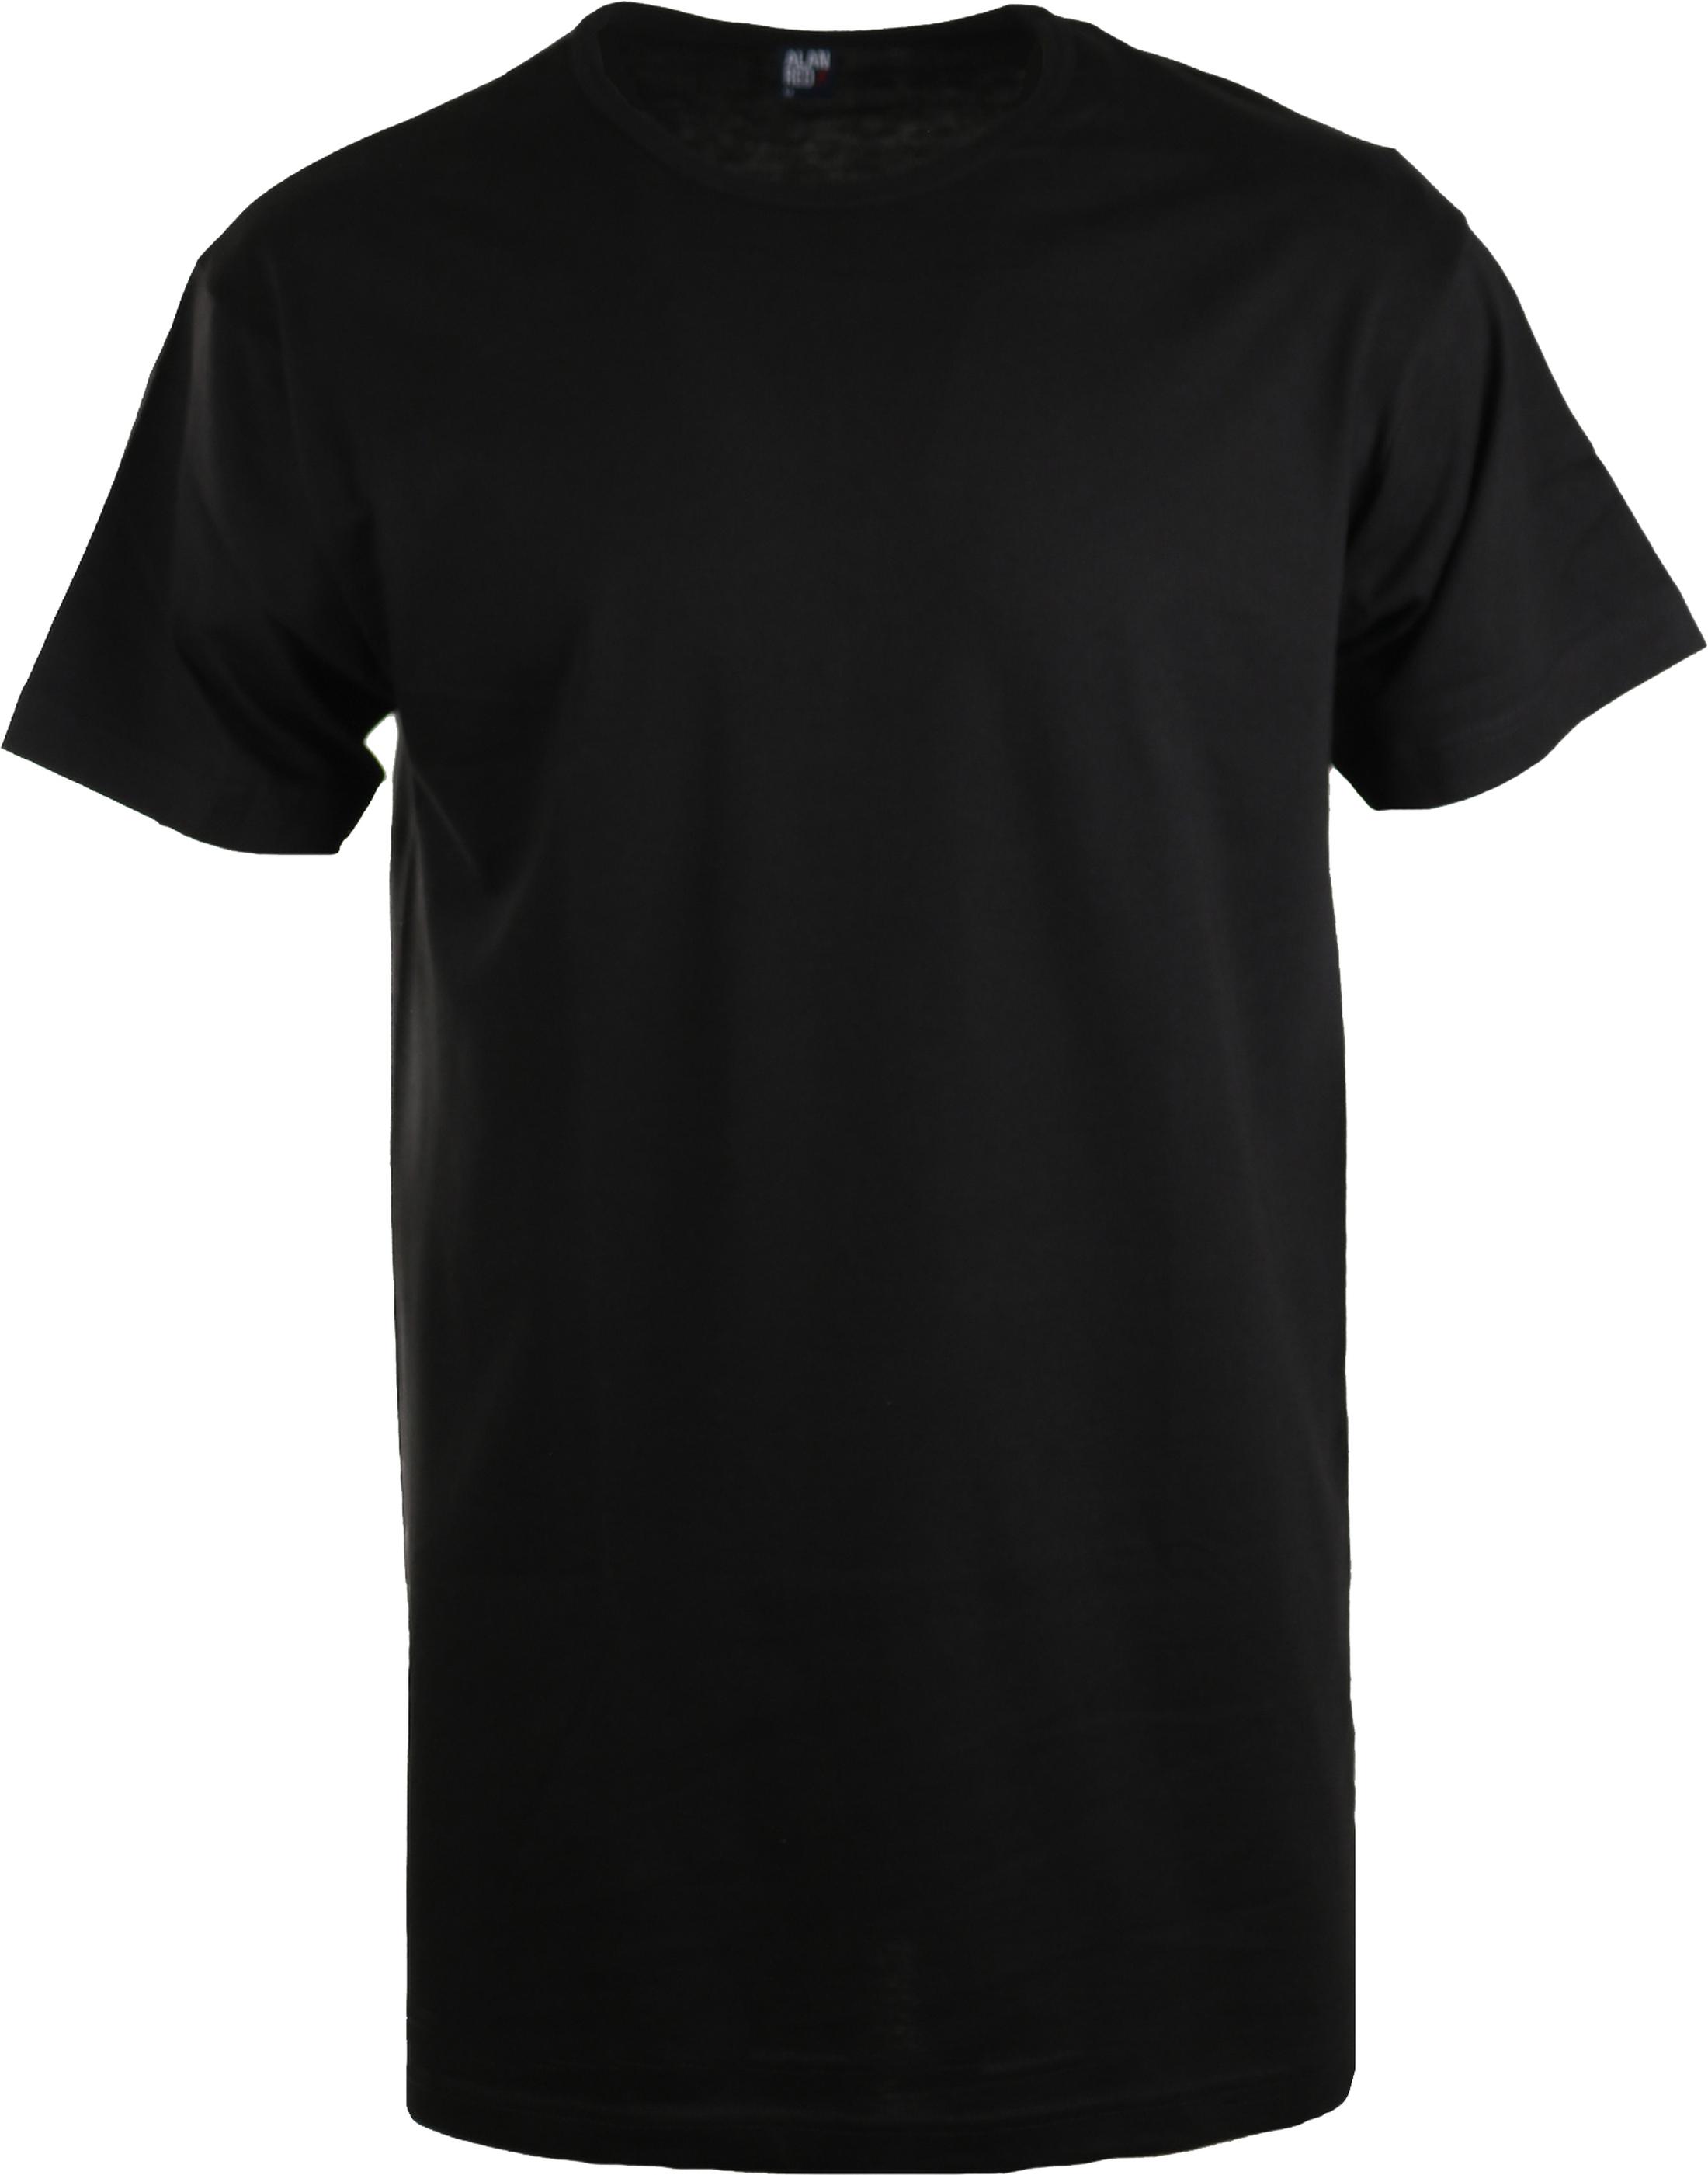 Alan Red Extra Lang T-Shirts Derby Schwarz (1 Pack) foto 0